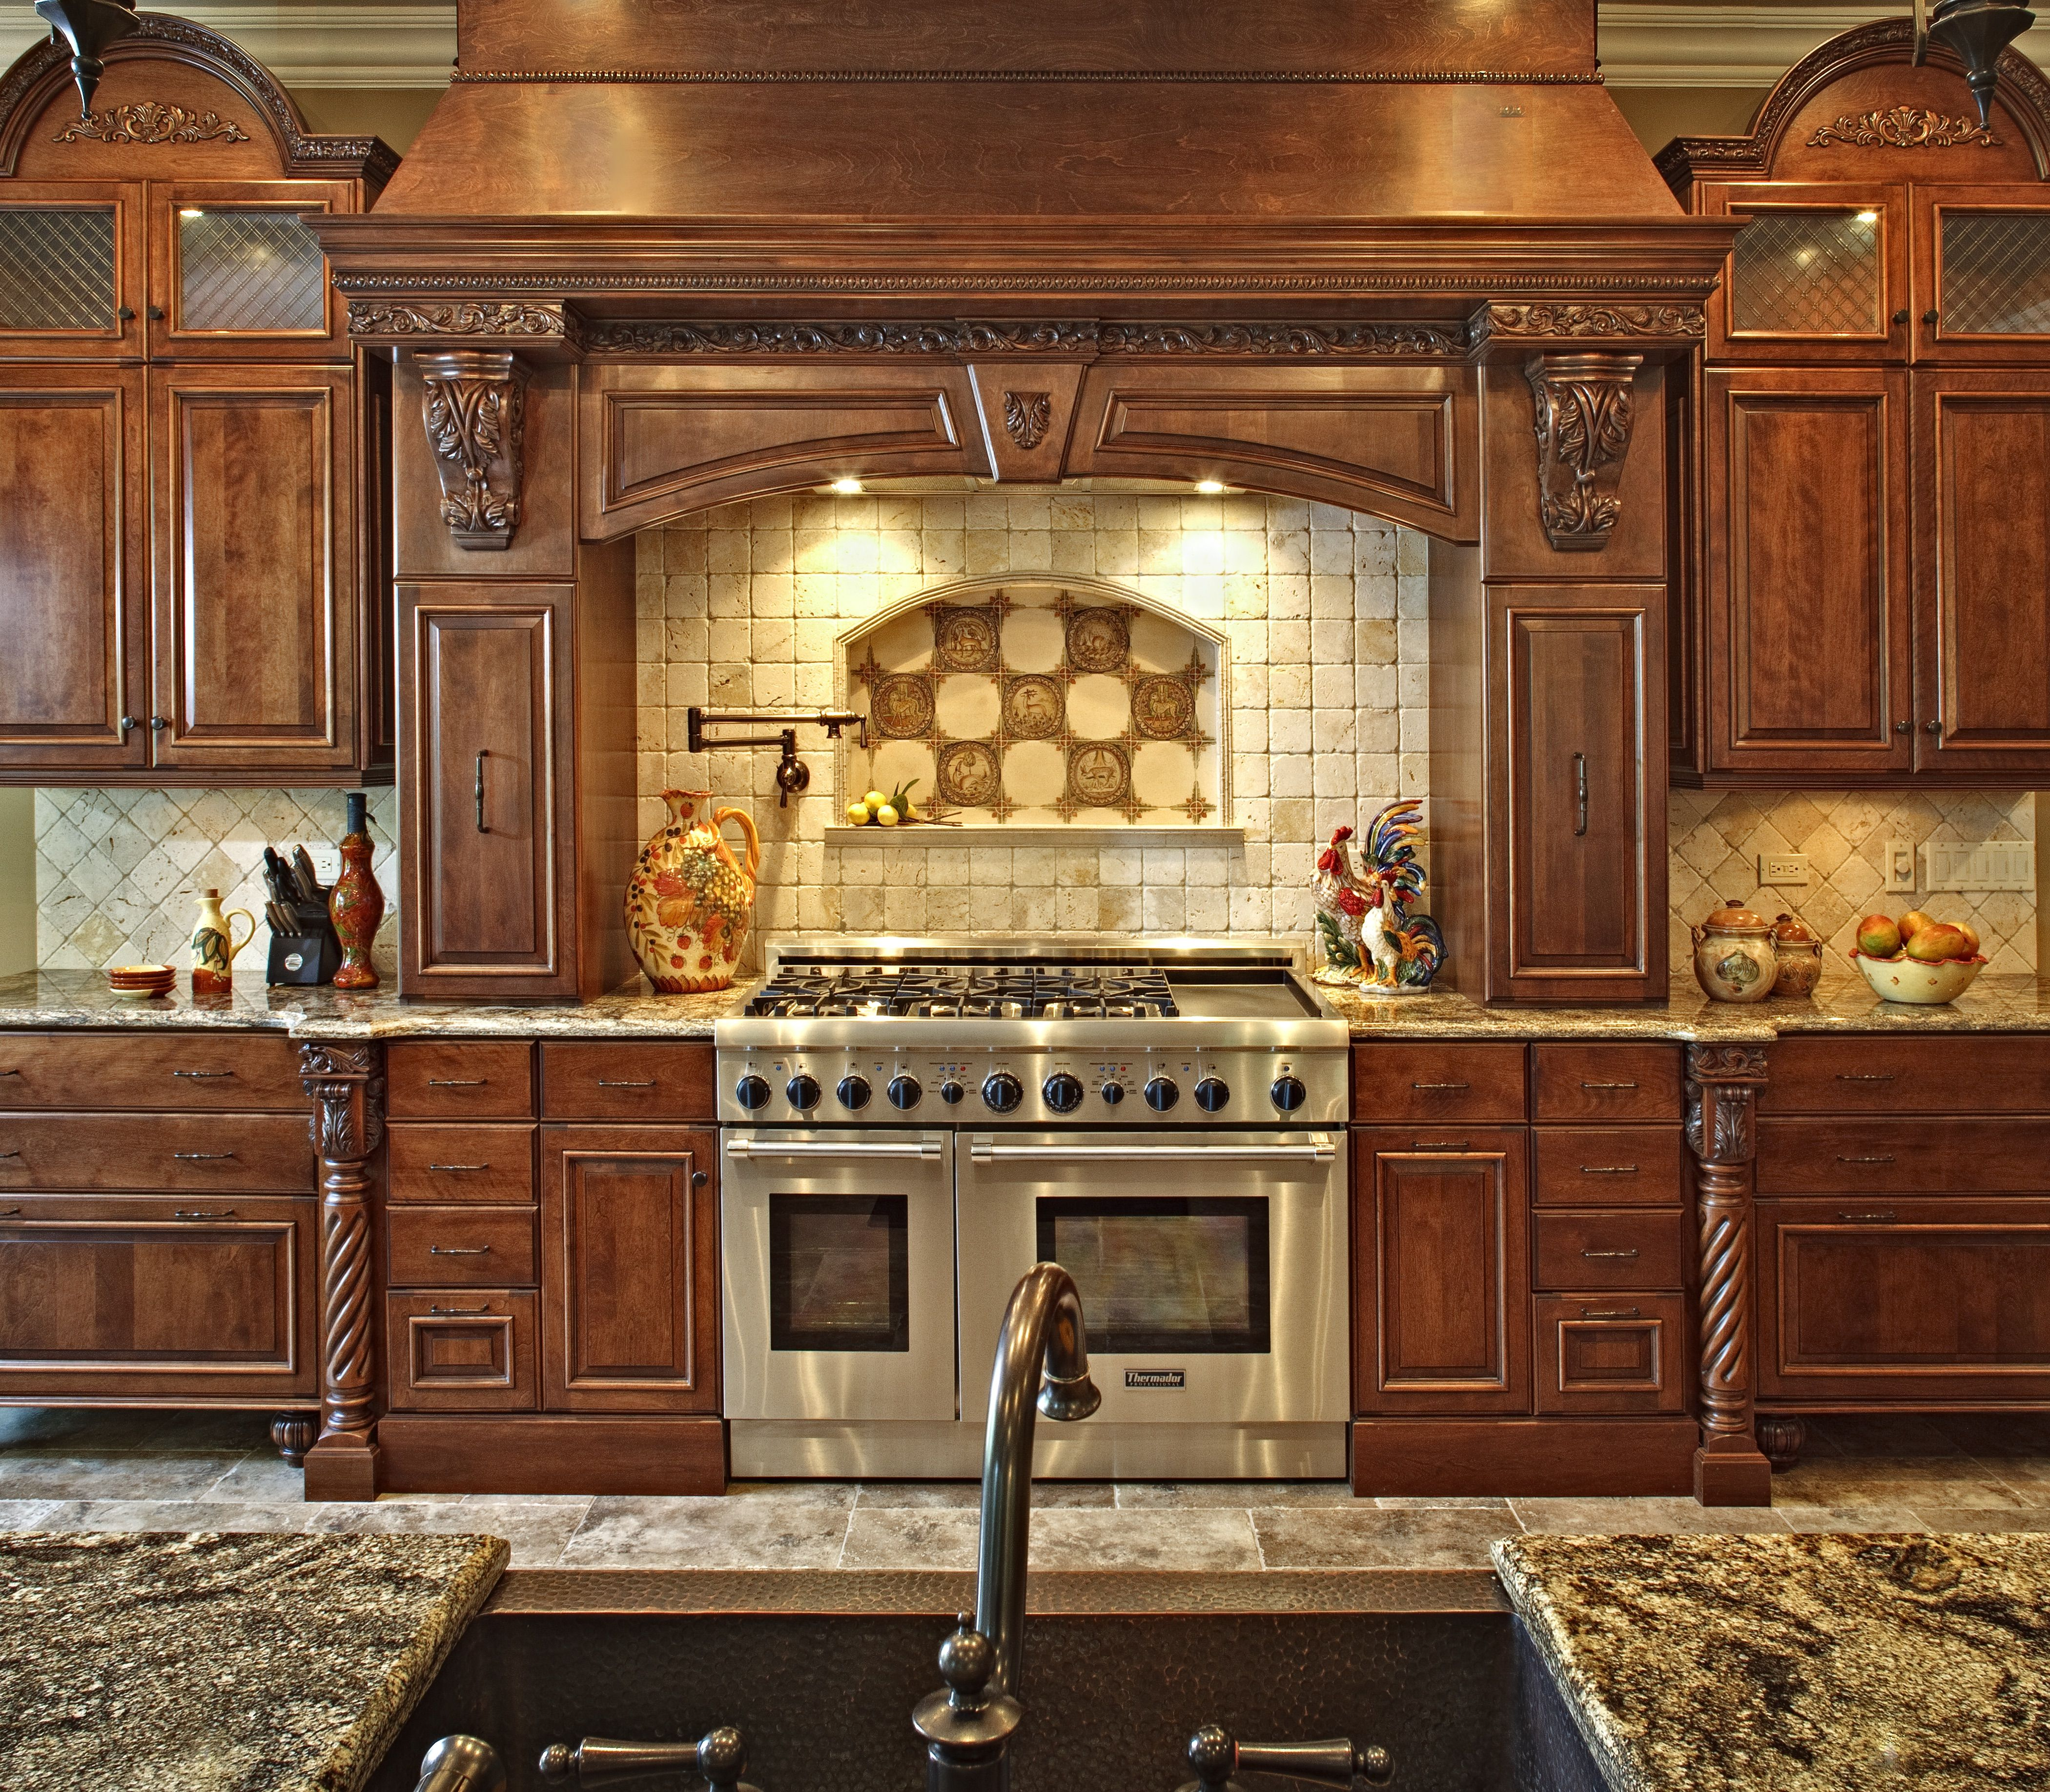 Luxury Custom Kitchen Hood By Southampton Builders Of Geneva Illinois Custom Home Designer Affordable Kitchen Remodeling Luxury Kitchen Design Tuscan Kitchen